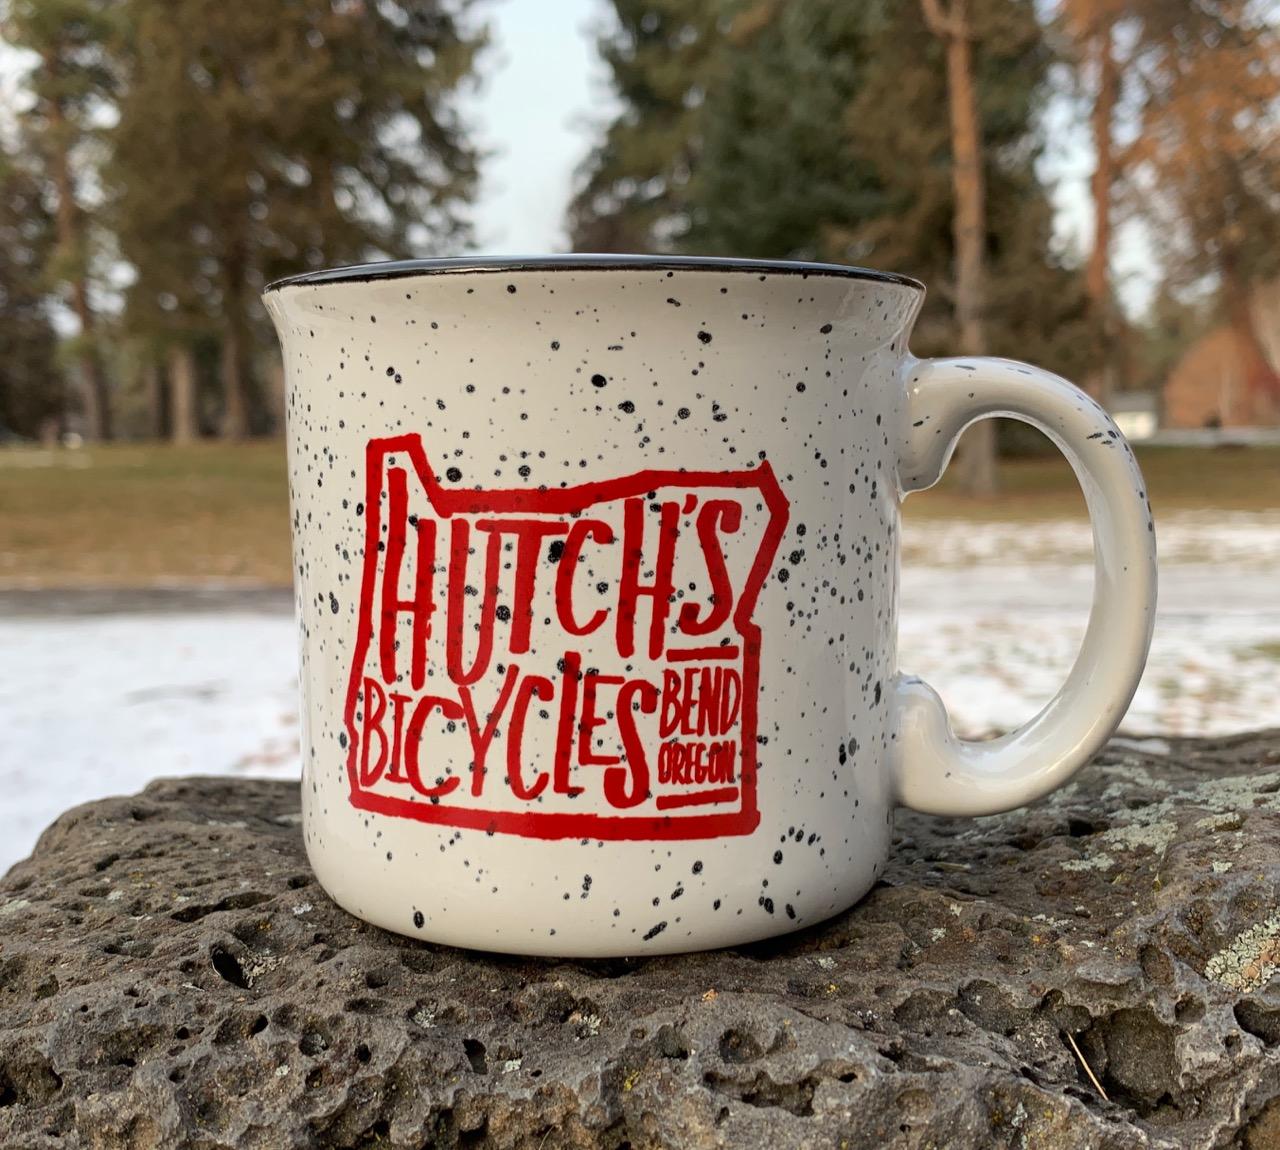 Hutchs_Bicycles_Coffee_Mug_Store.jpg